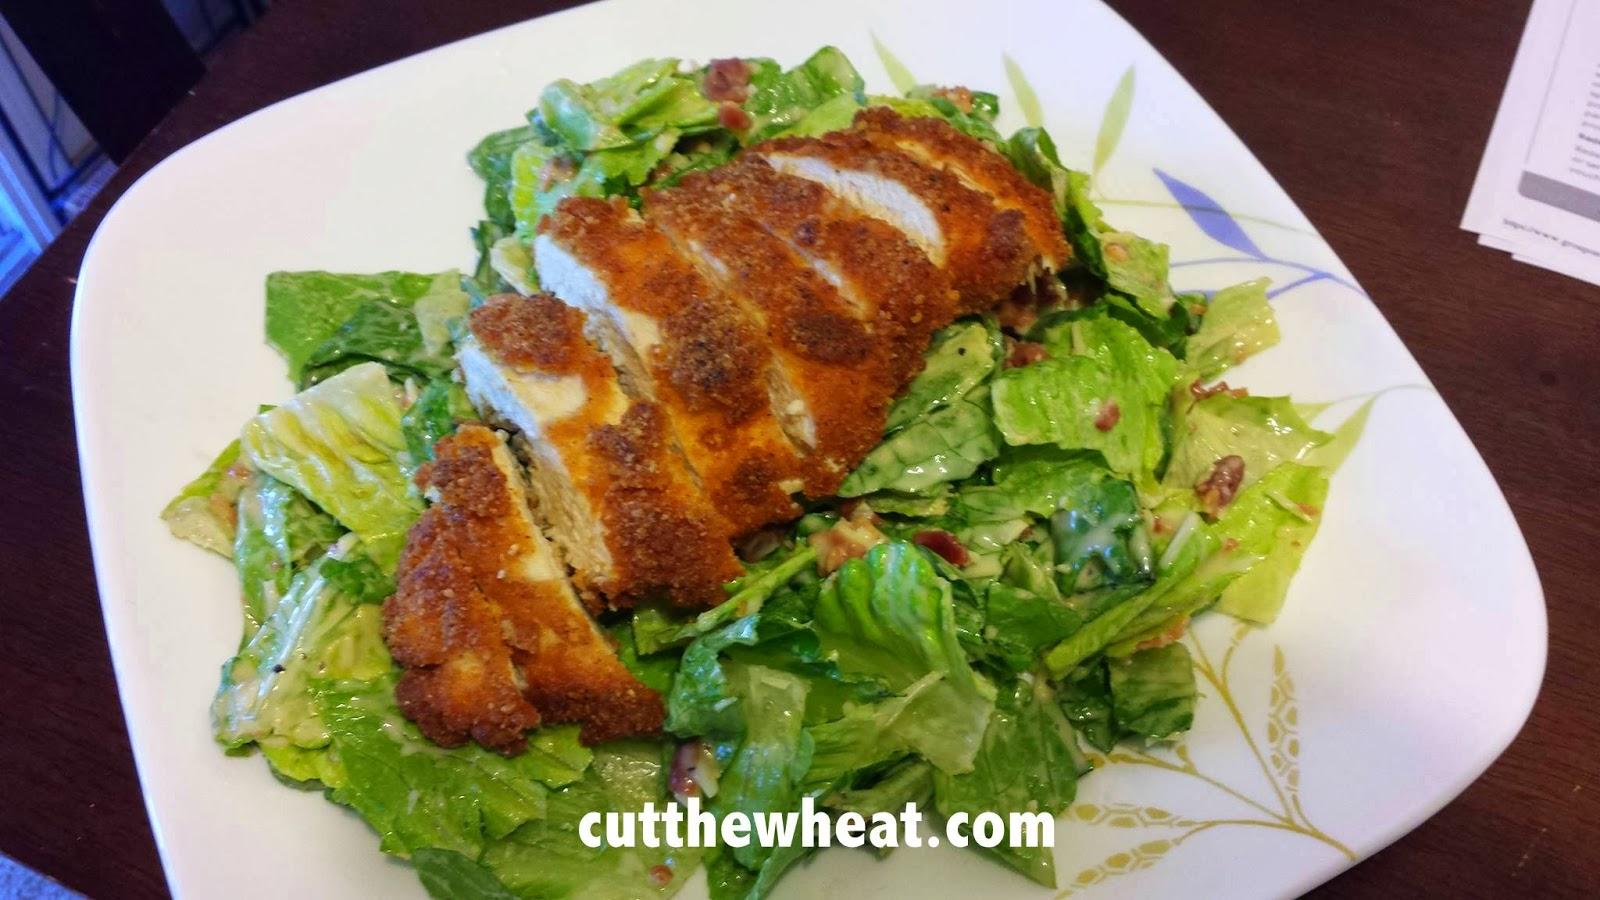 Boneless, skinless fried chicken breast over caesar salad